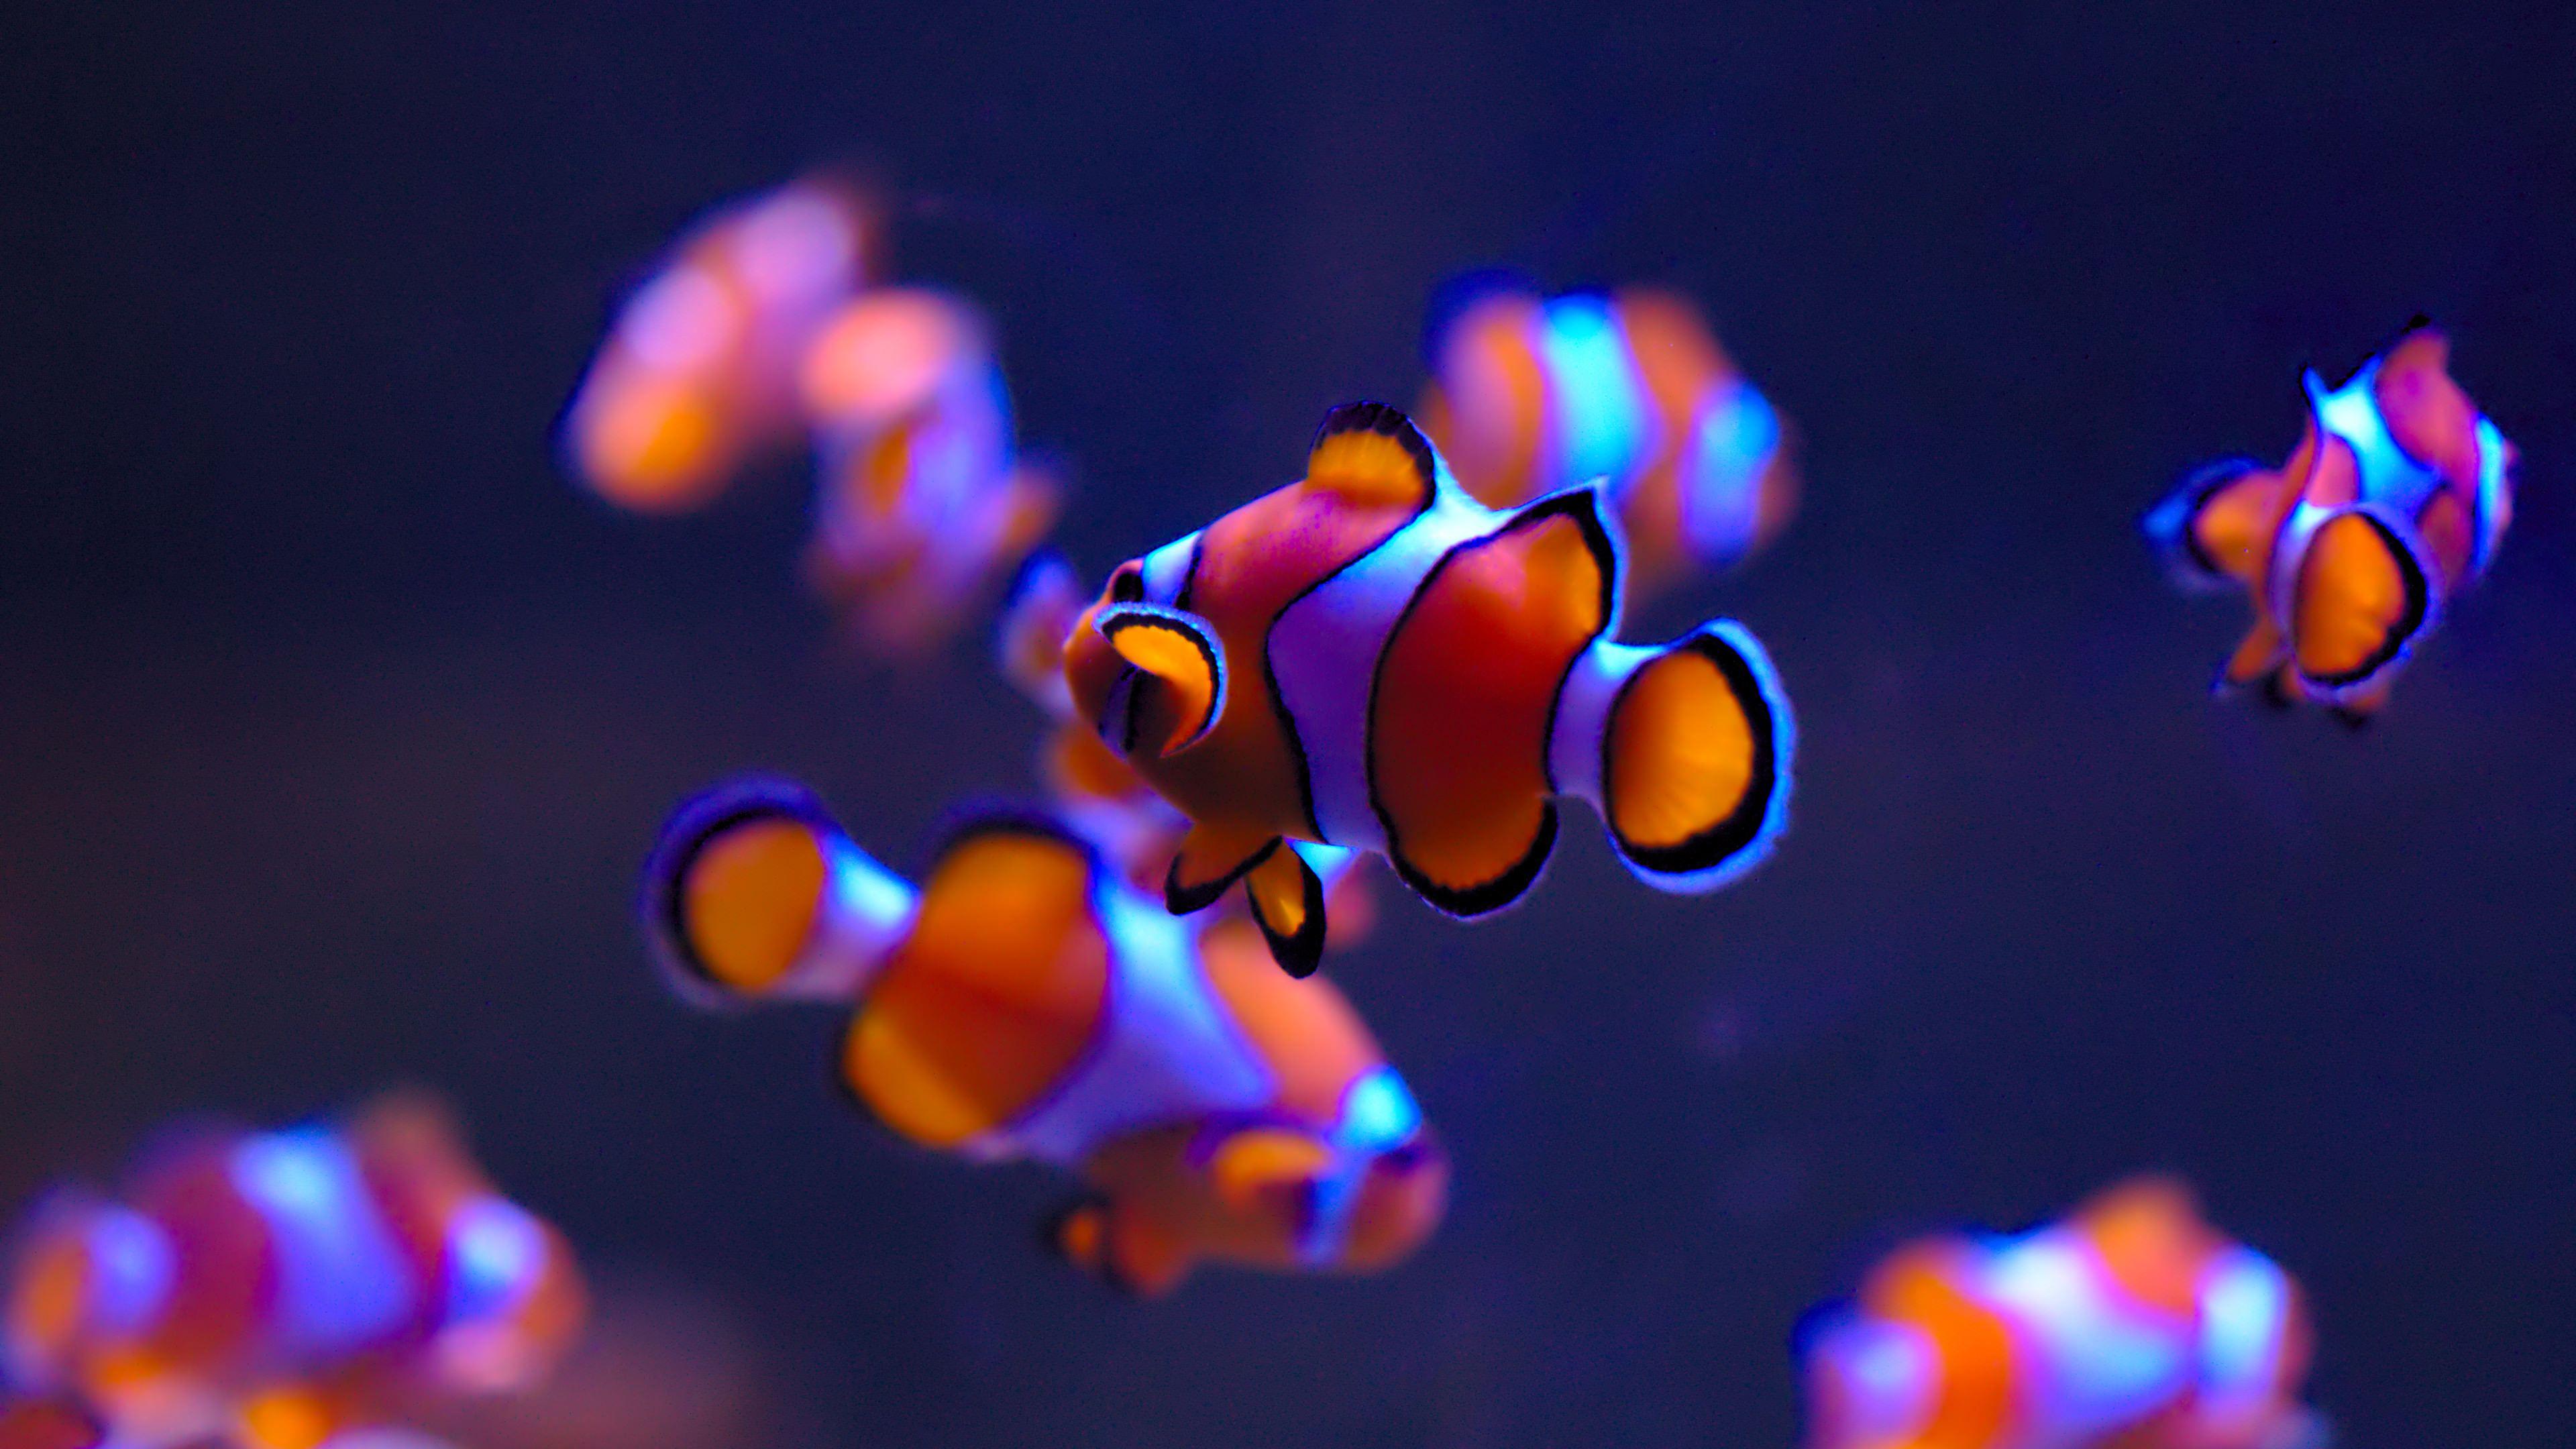 Clown Everywhere 3840 X 2160 Clown Fish Fish Wallpaper Animal Wallpaper